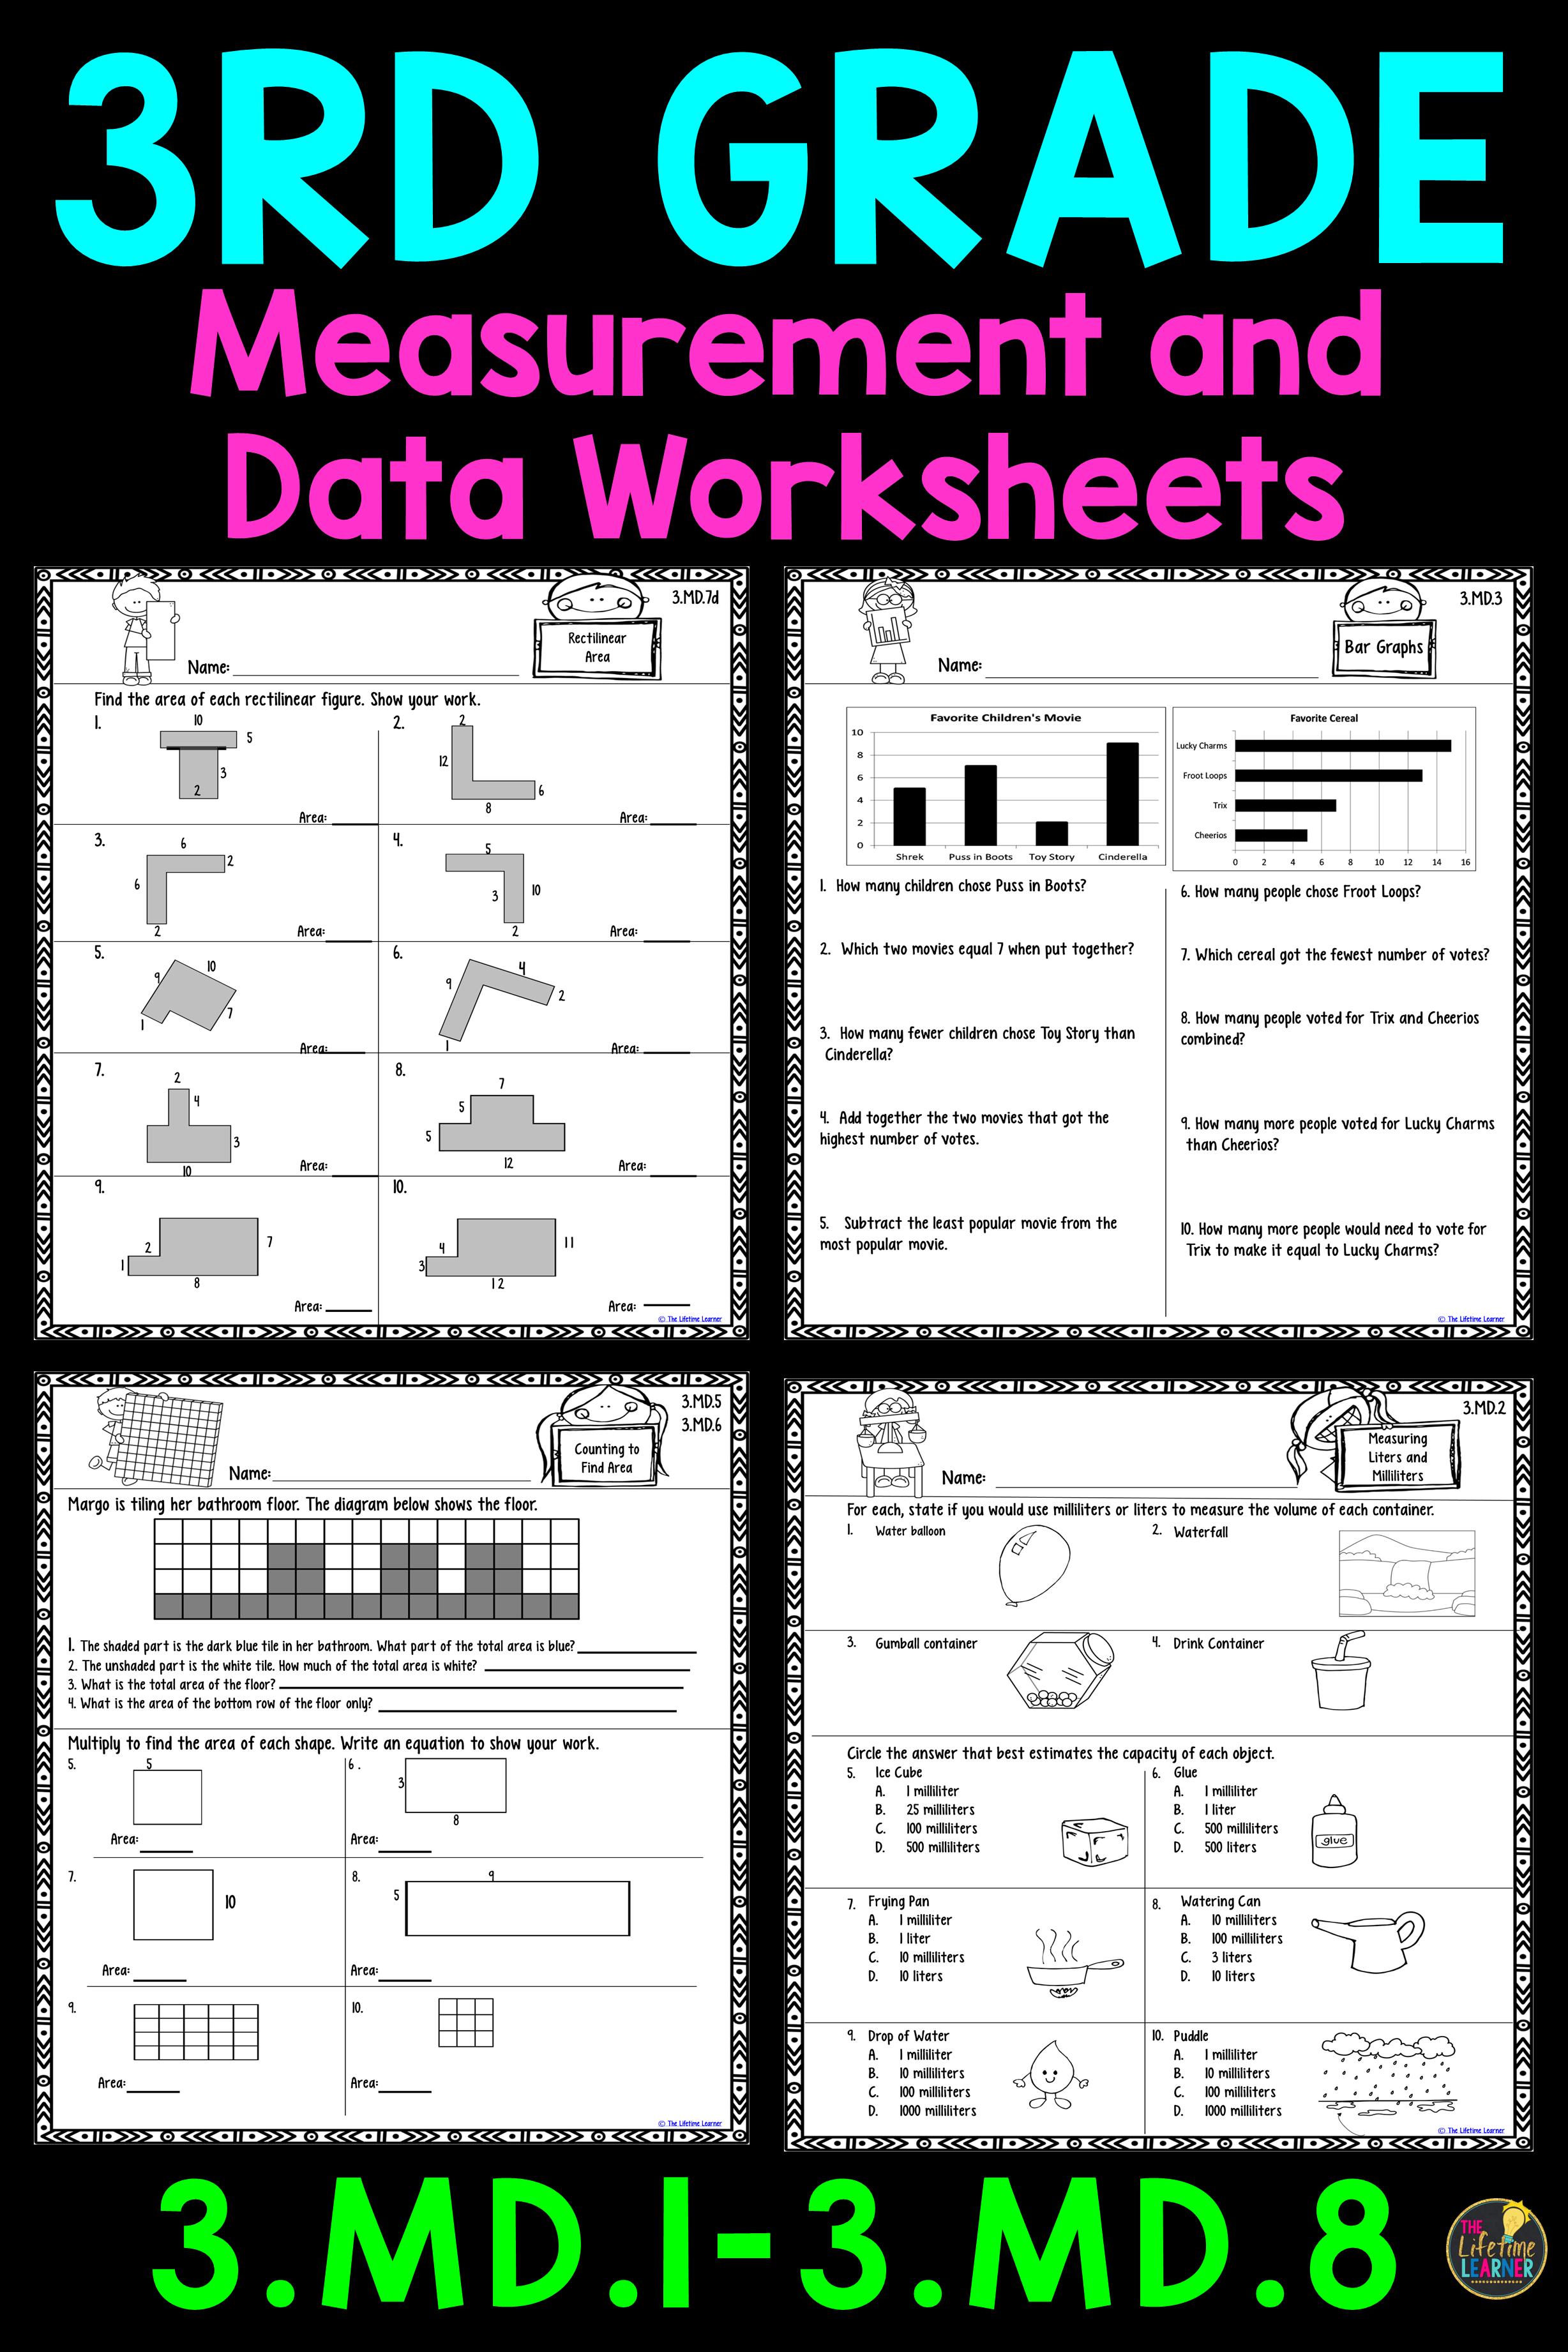 3rd Grade Measurement And Data Worksheets 3rd Grade Math Worksheets 3rd Grade Math Common Core Math Worksheets